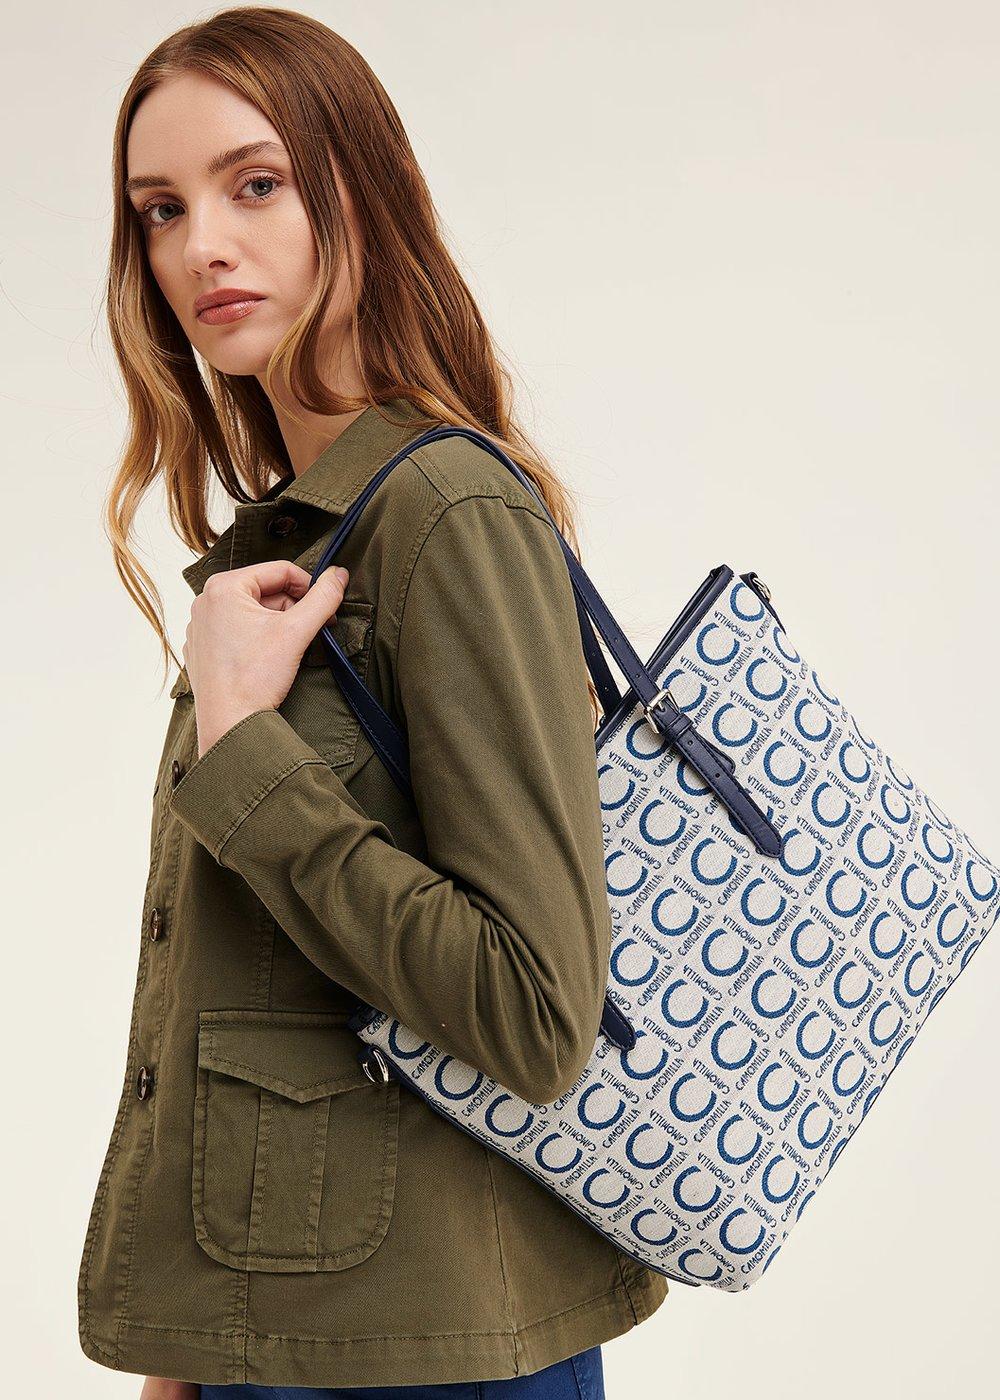 Logomania shopping bag - Avion / White - Woman